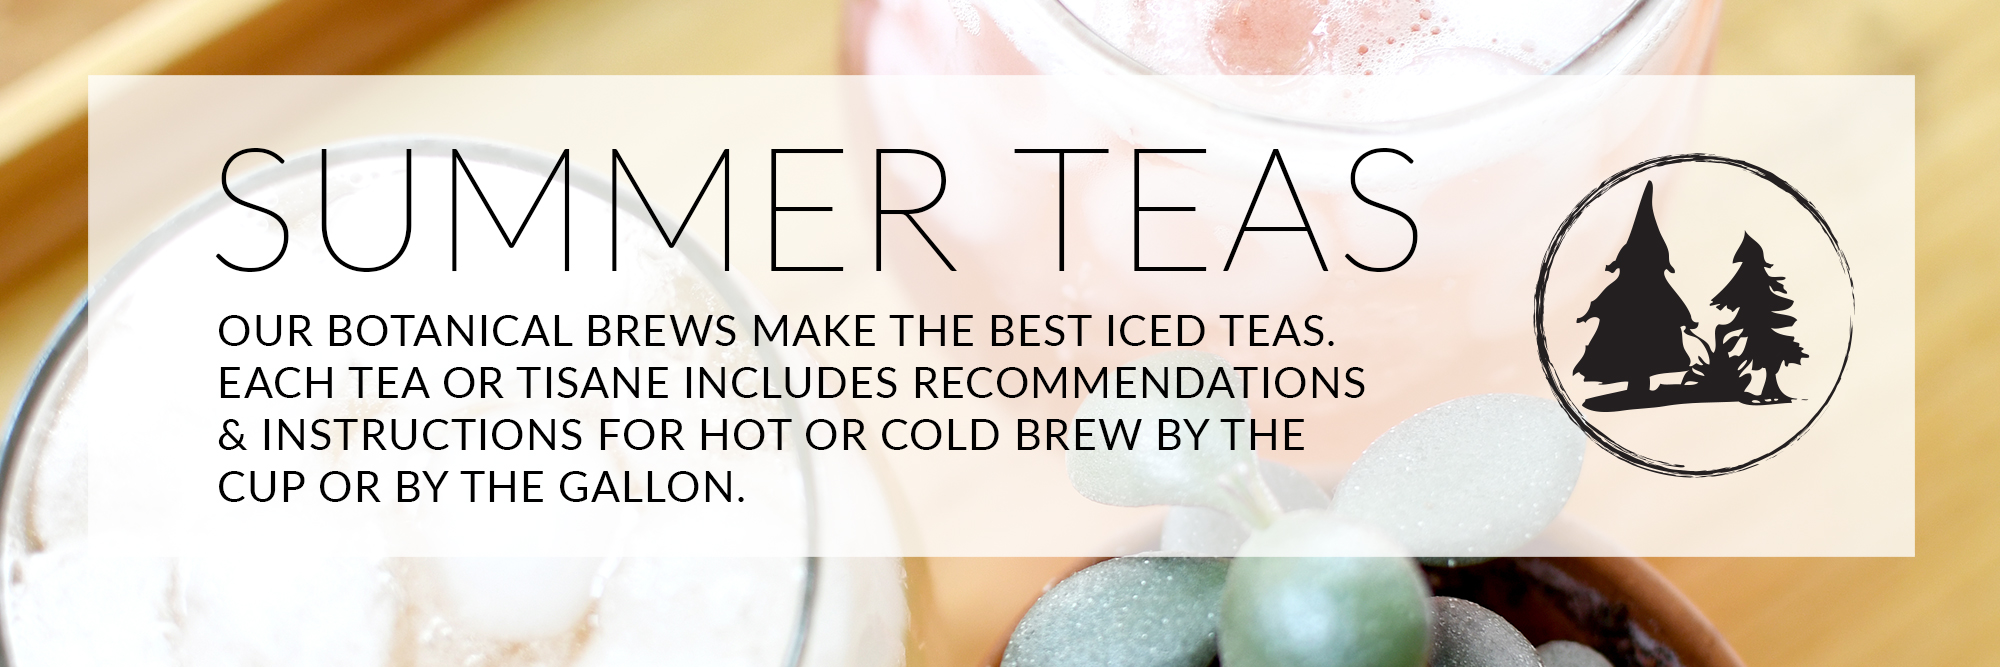 Summerfavs web banner